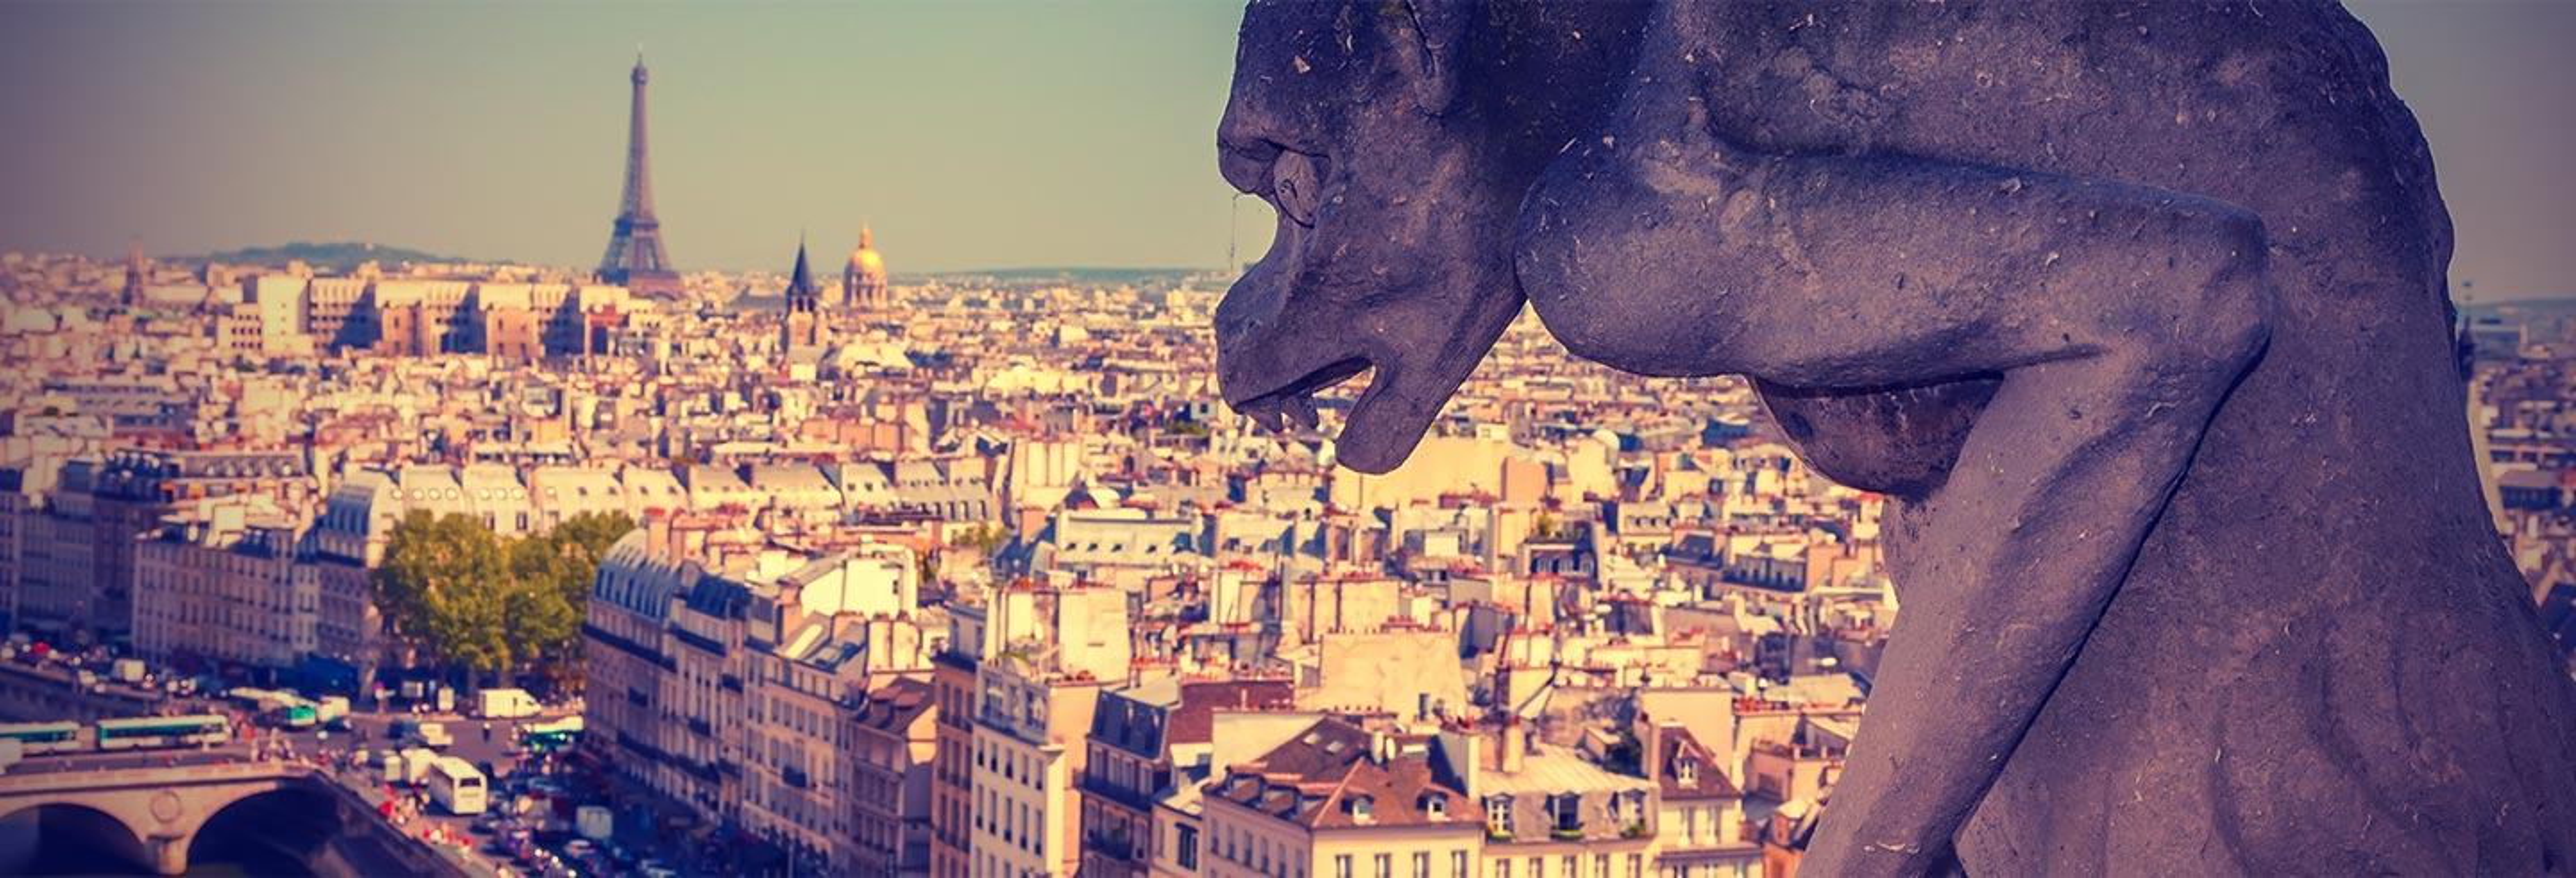 Free tour de misterios y leyendas de París